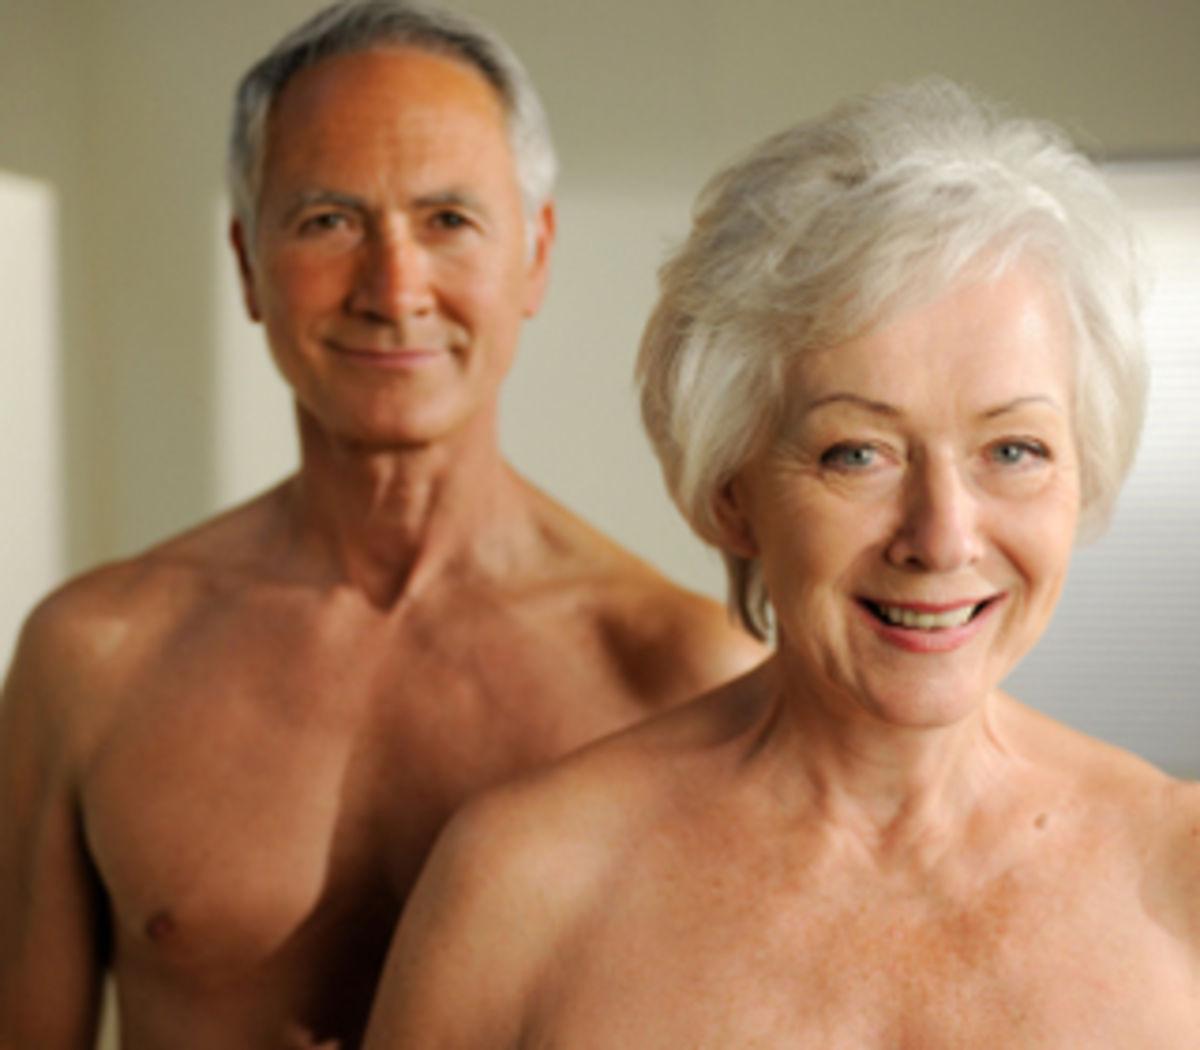 Porn addiction and spouse